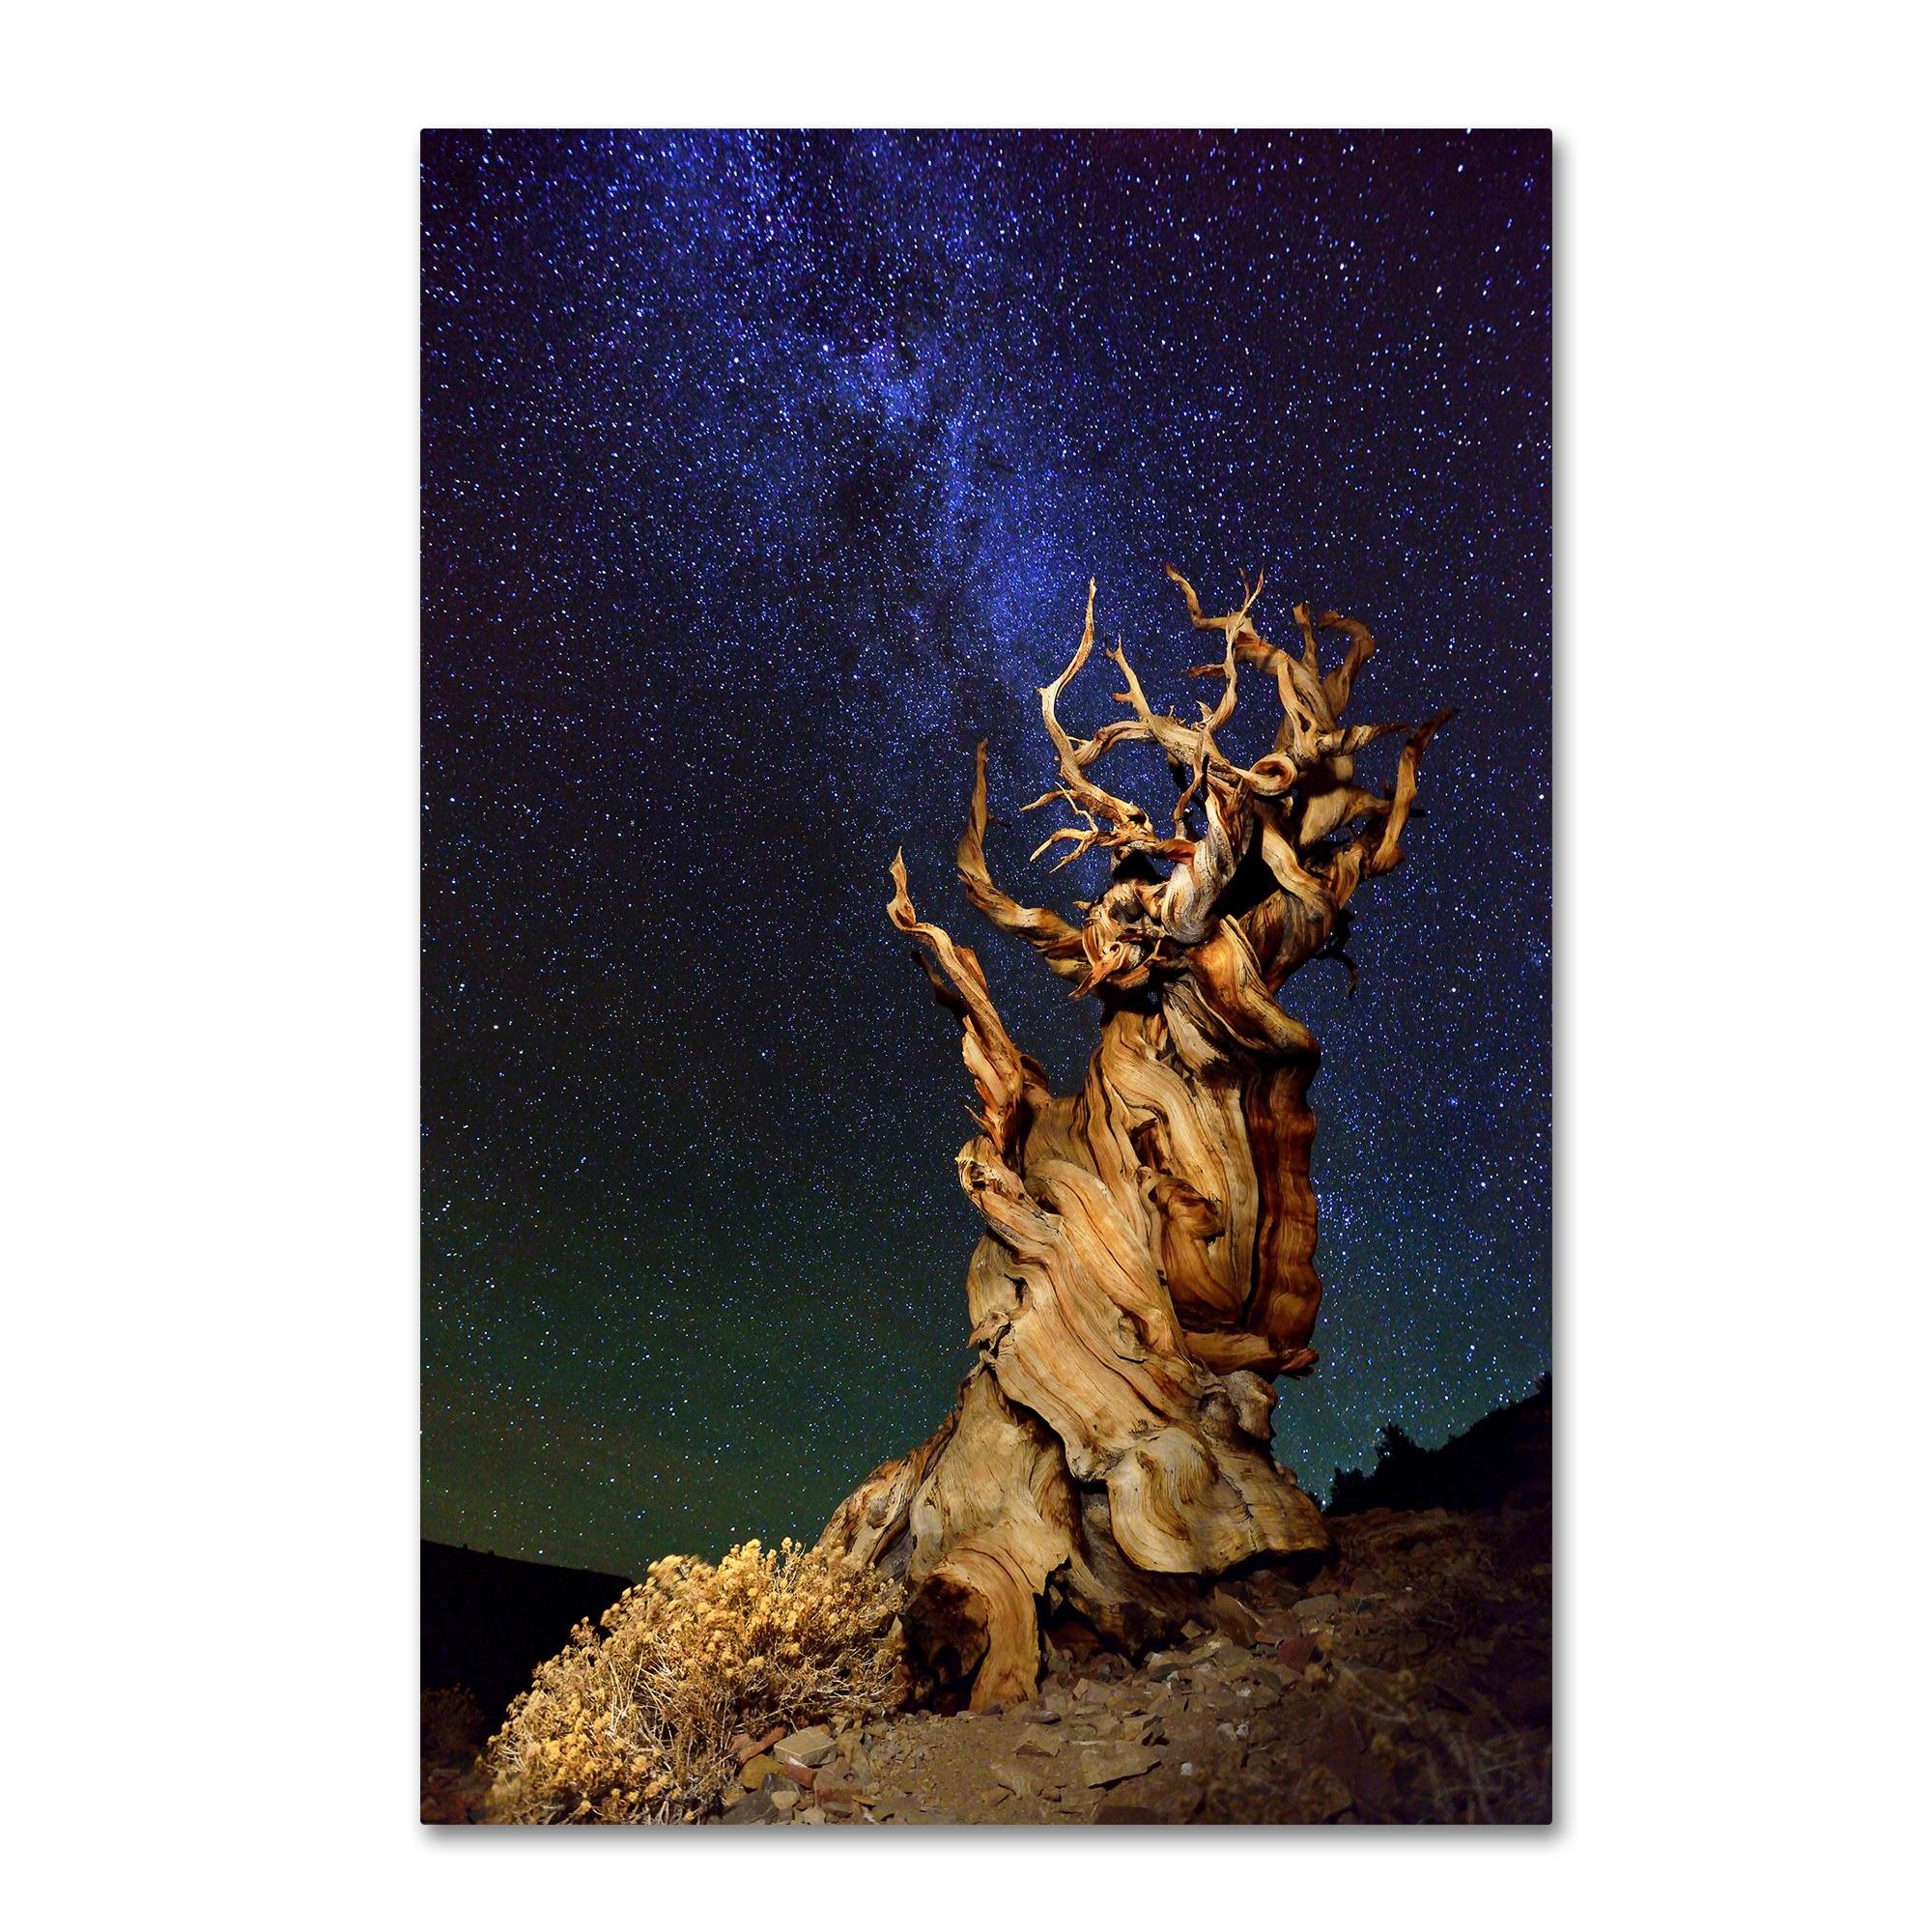 Tanja Ghirardini 'Bristlecone Pine' Canvas Art (16x24)